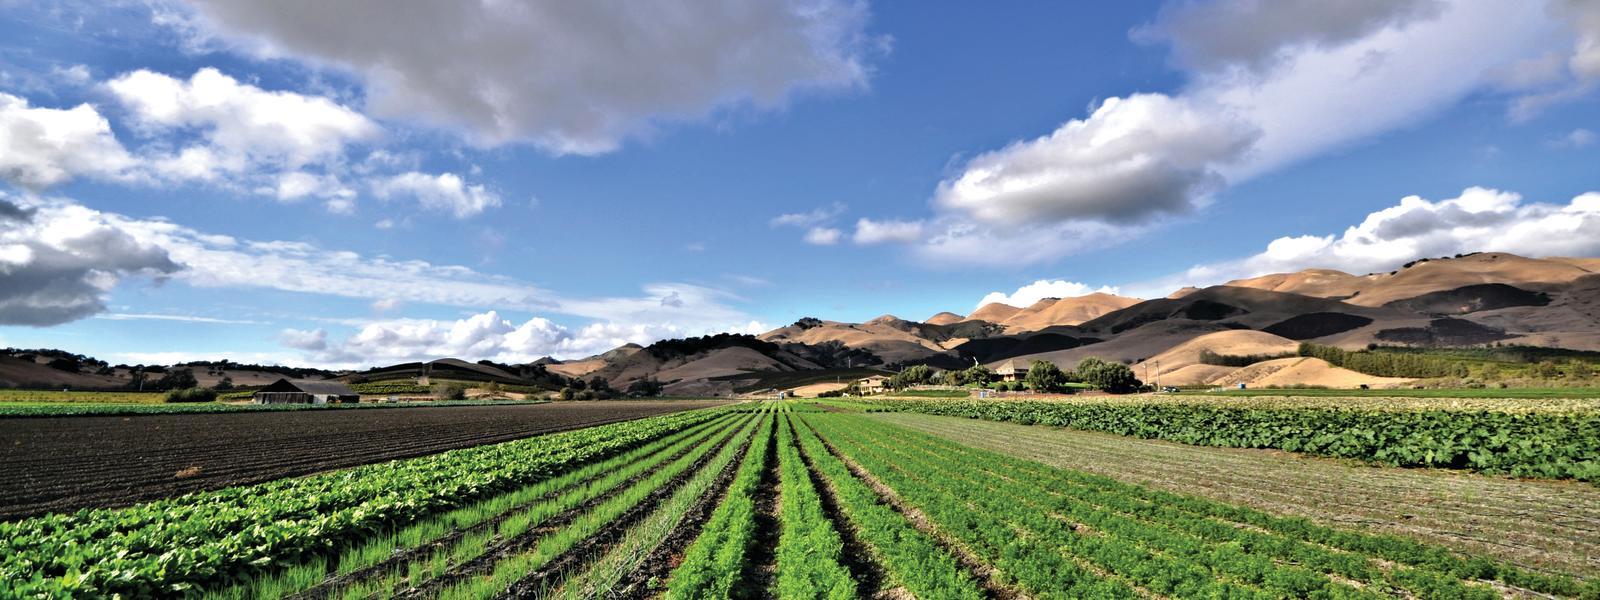 Talley Farms Vineyard 01